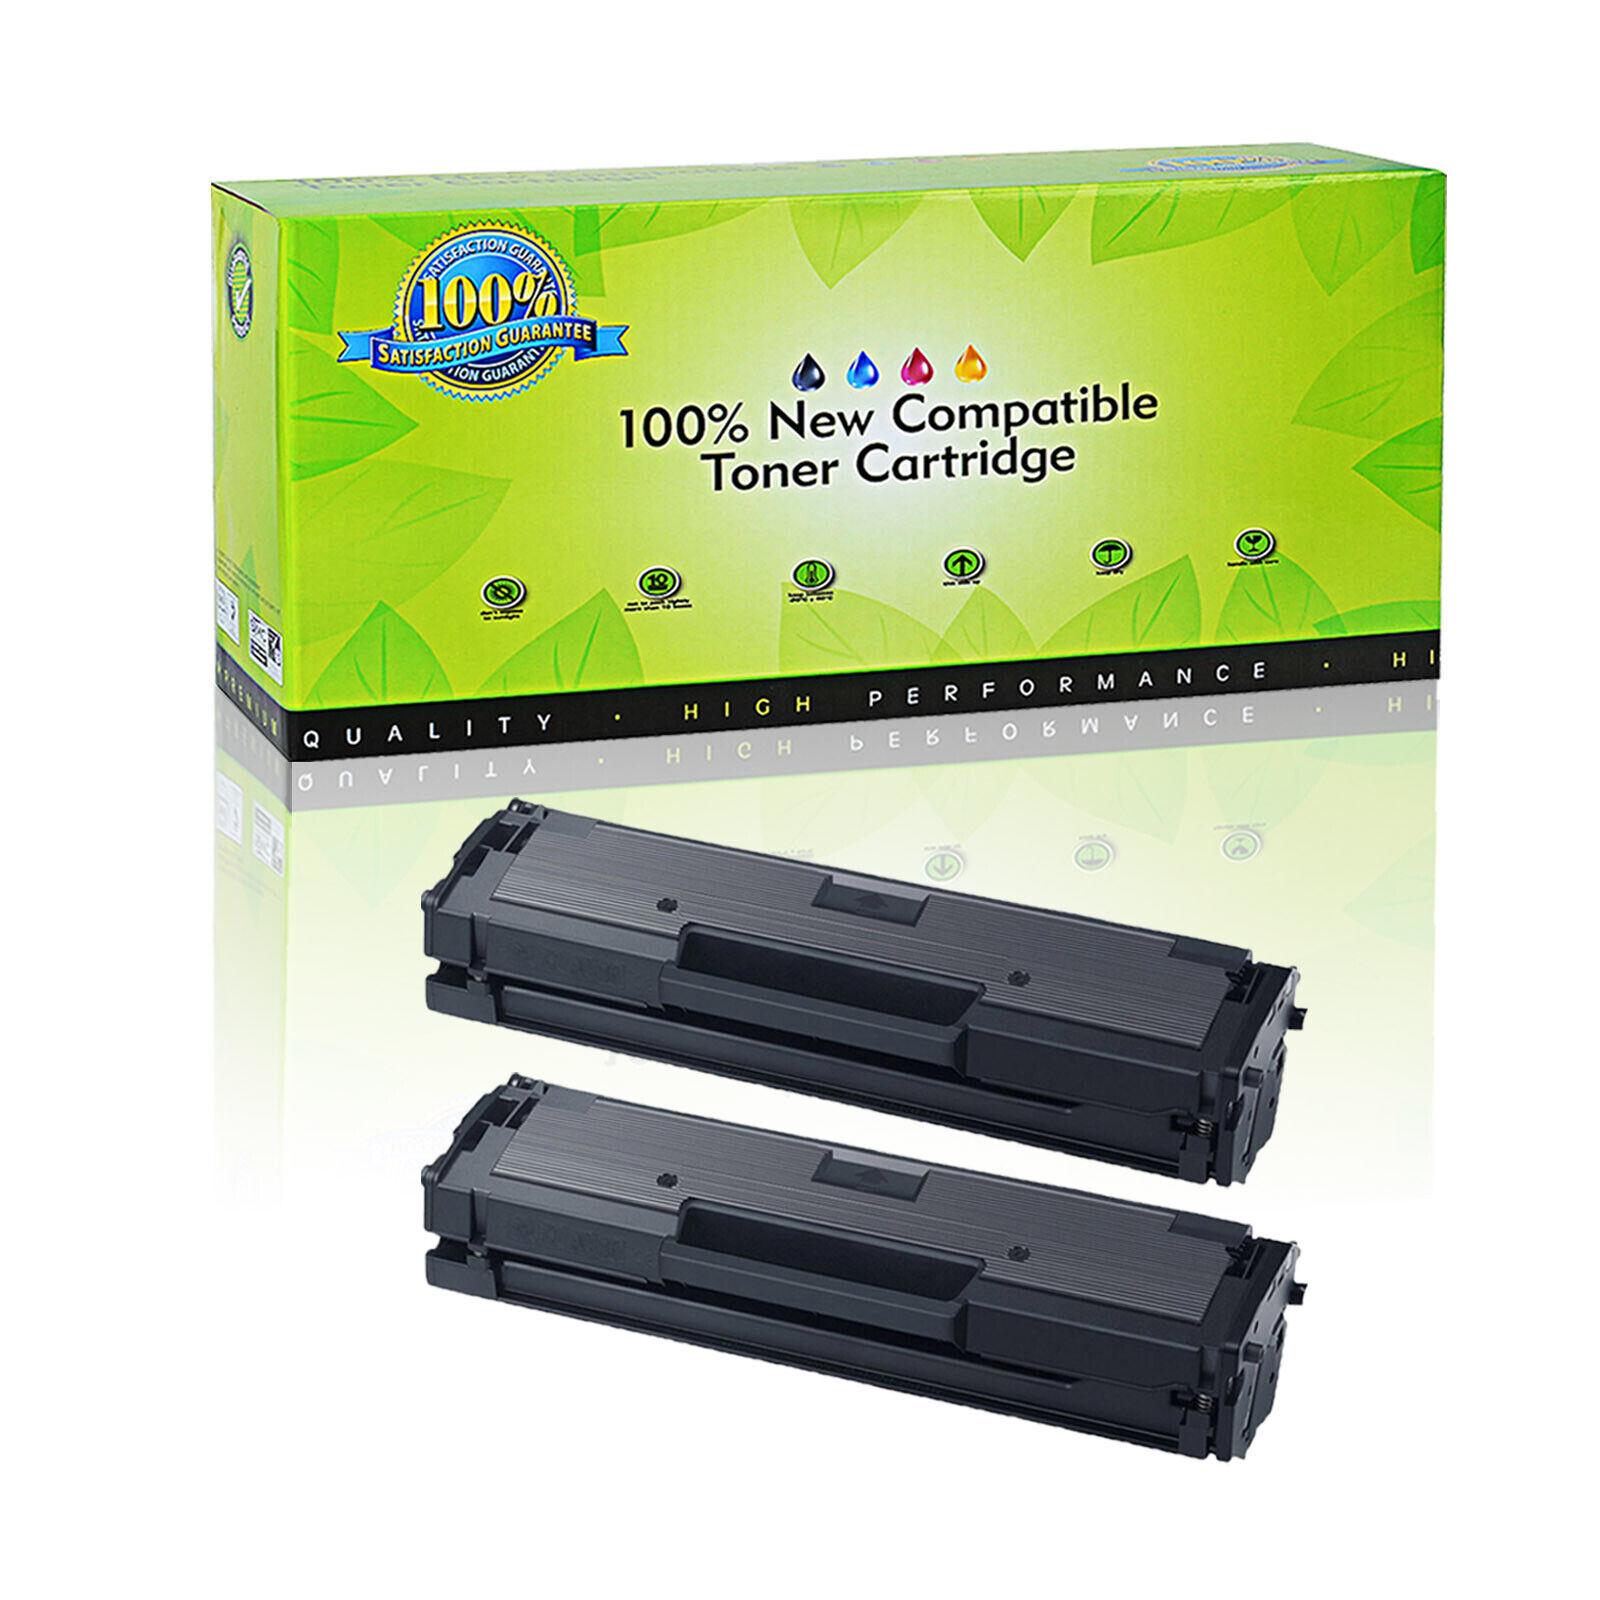 2 x Black Non-OEM Toner Cartridge For Samsung Xpress SL-M2070W SL-M2020